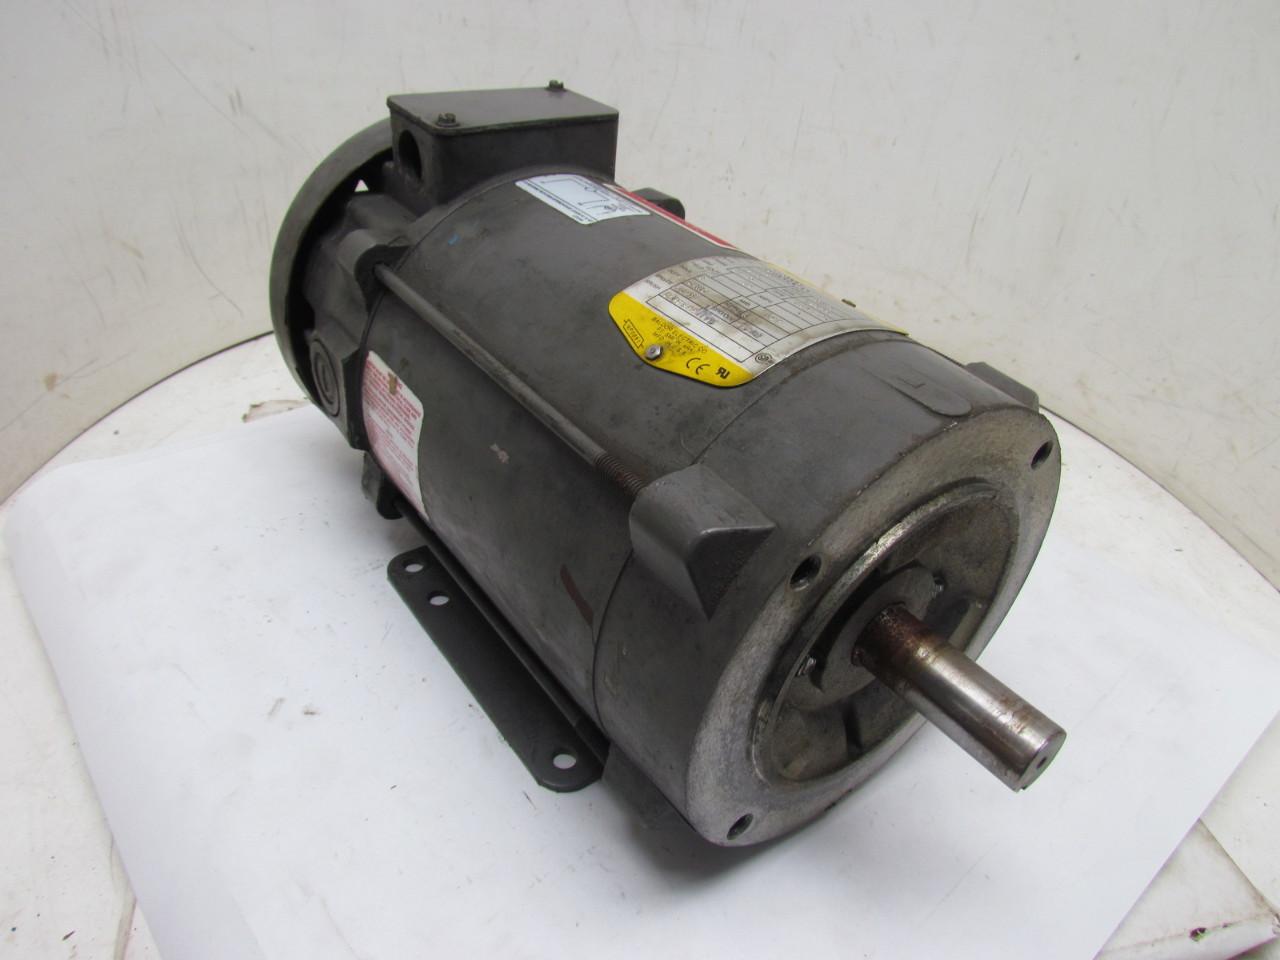 Baldor cdp3580 35p432z183 180v dc motor 1 5hp 2500 rpm for 180v dc motor suppliers